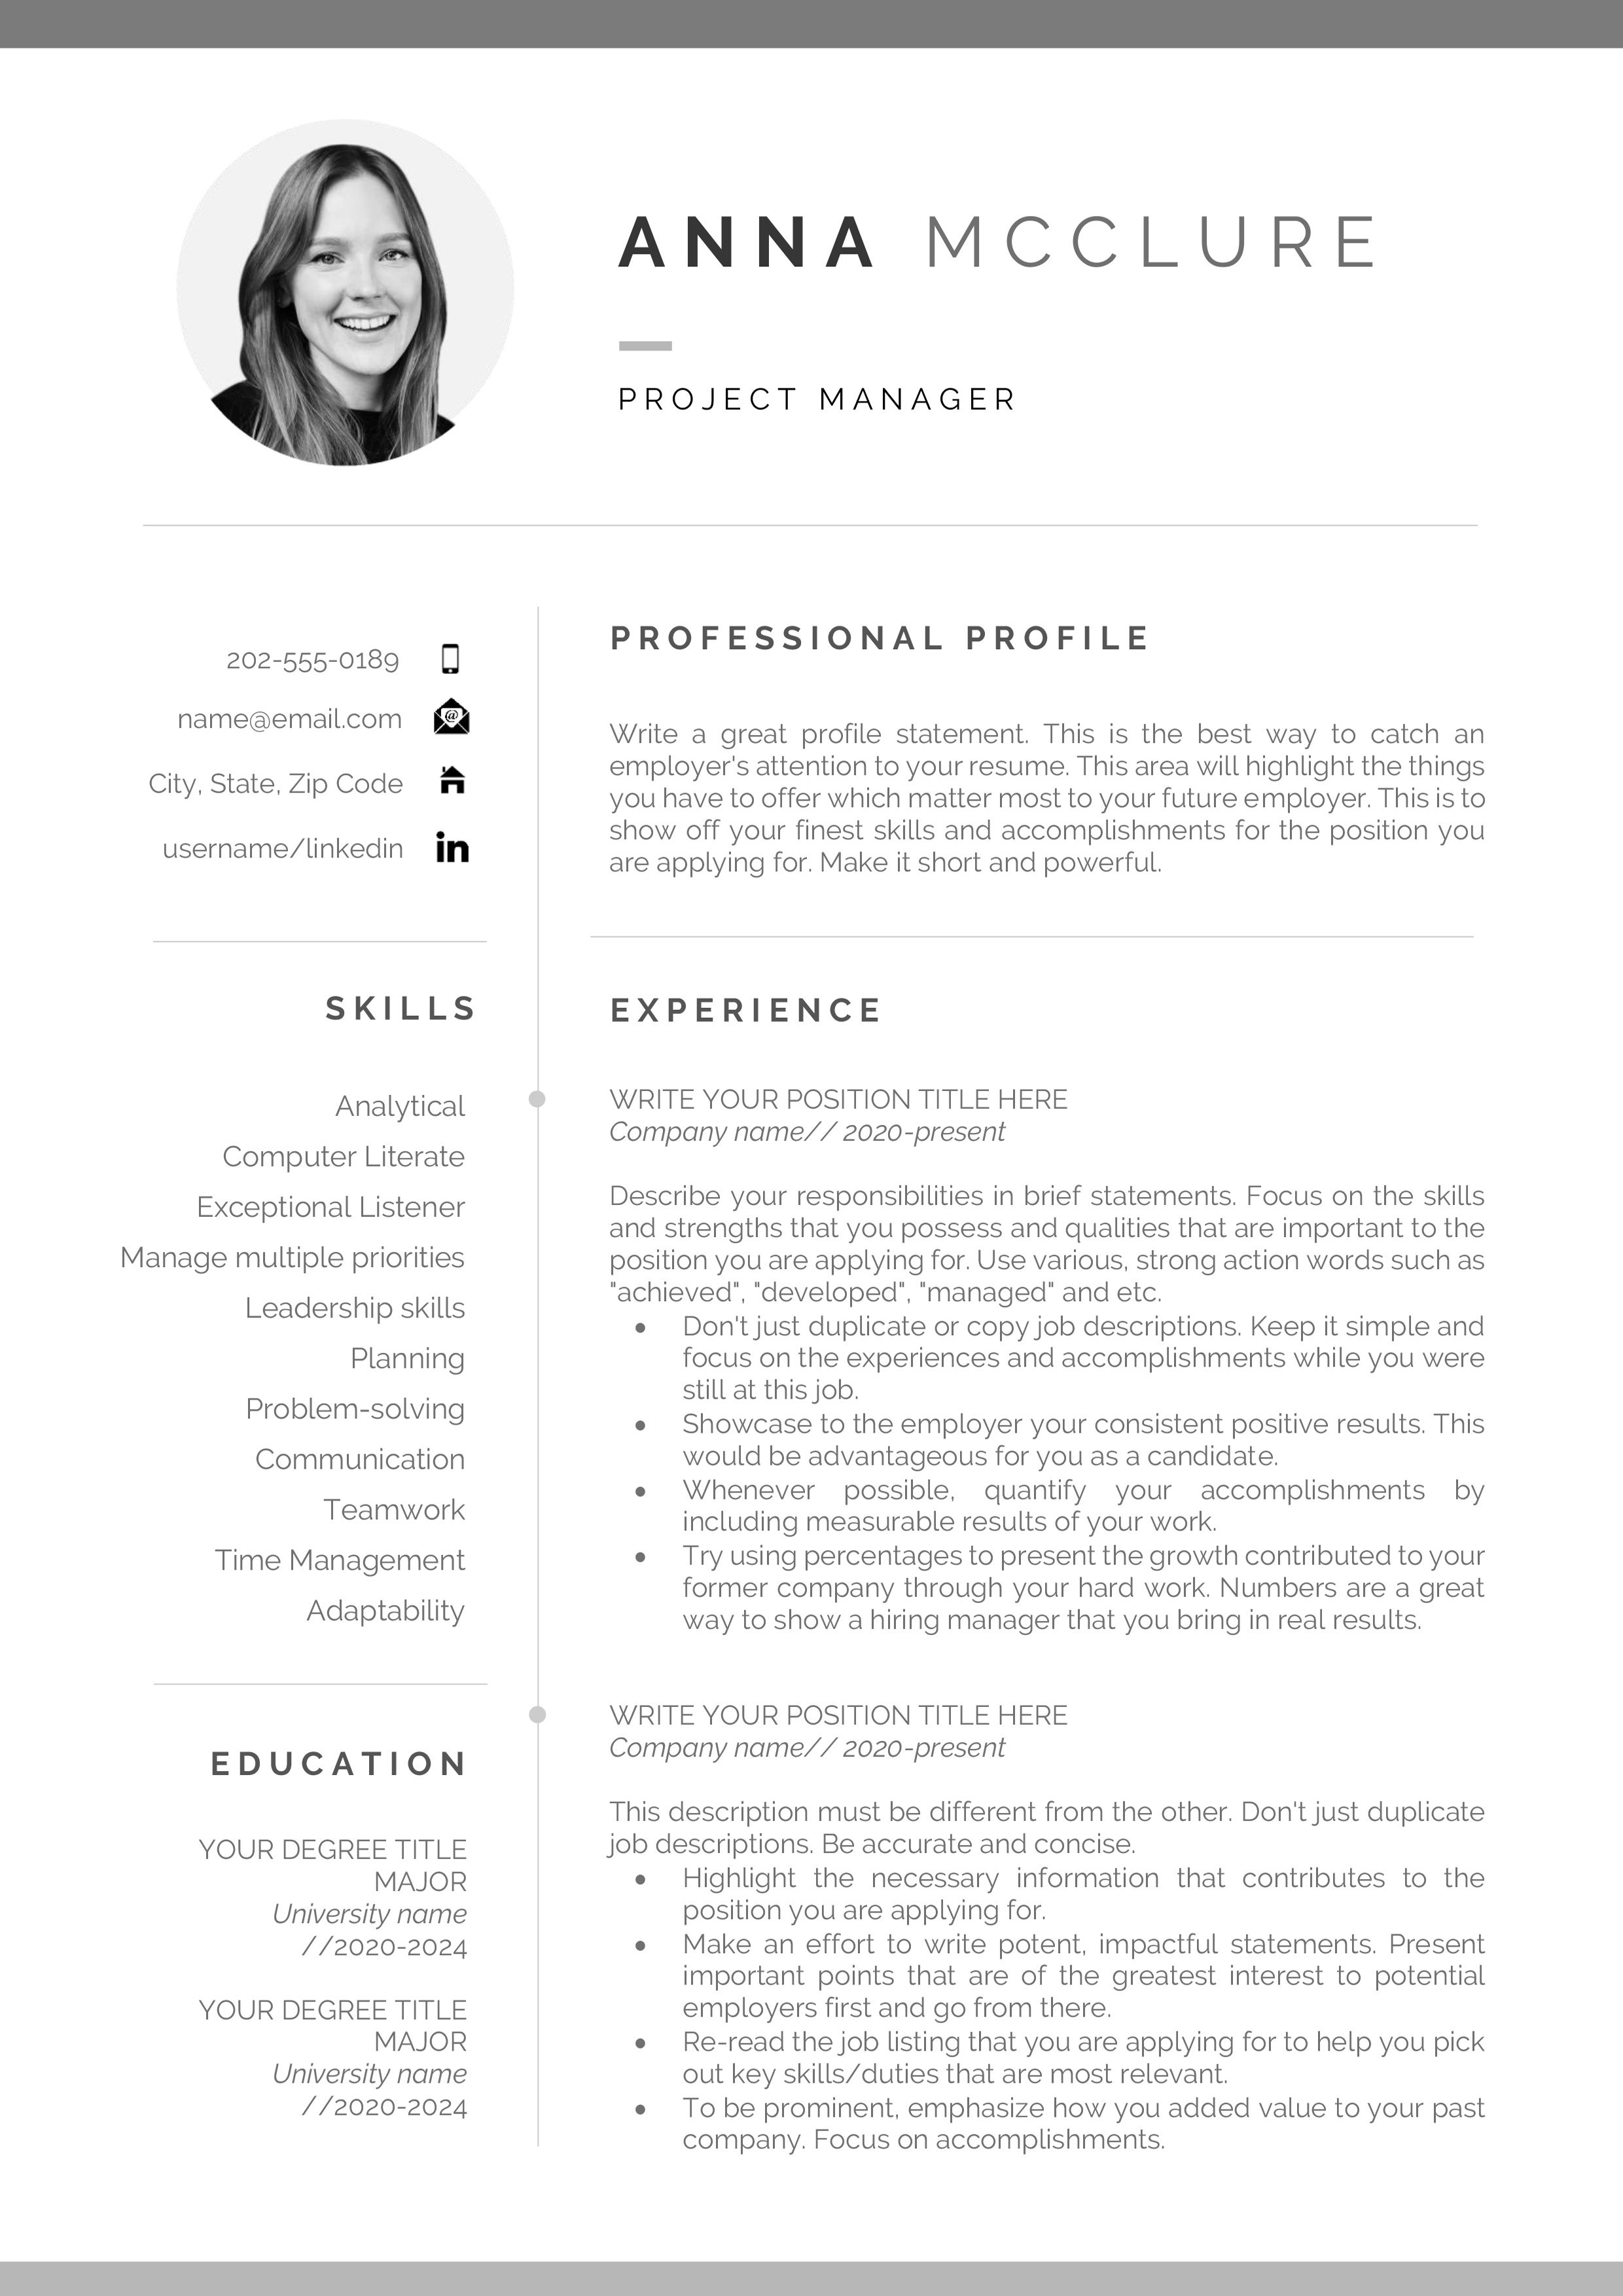 Resume Resume Template Professional Resume Template Resume Etsy In 2020 Cv Template Resume Template Professional Resume Template